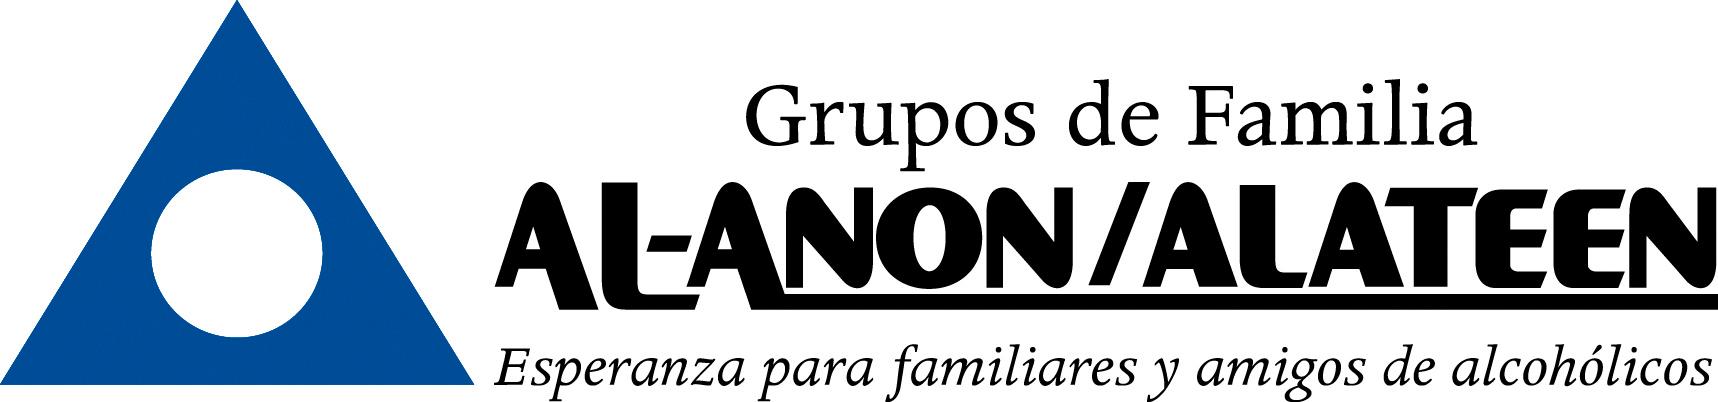 Al-Anon / Alateen Argentina